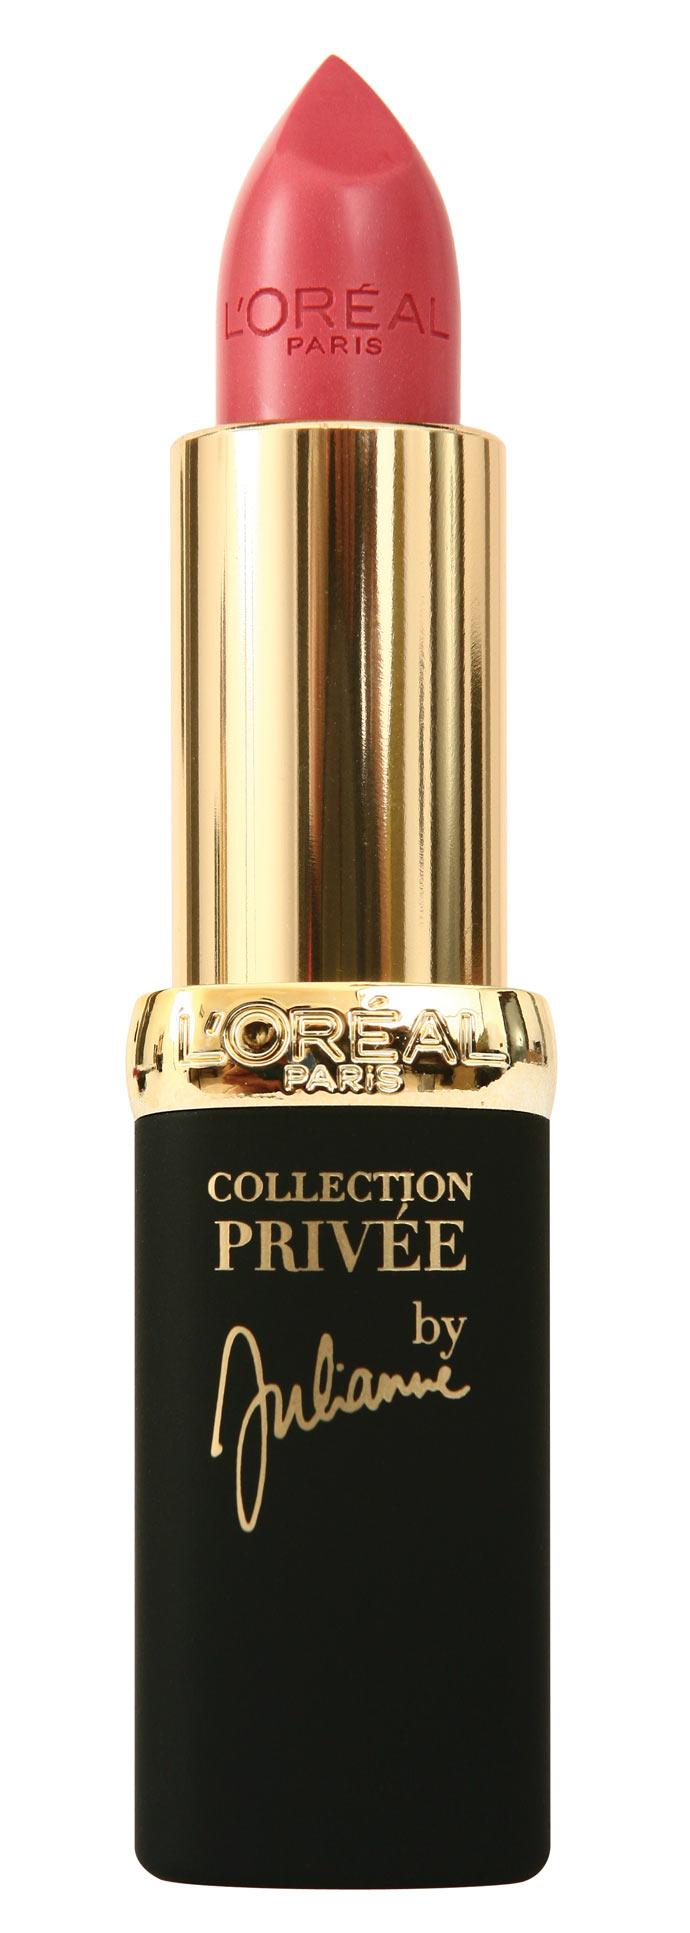 L'Oreal Paris Collection Privee ruj Julianne